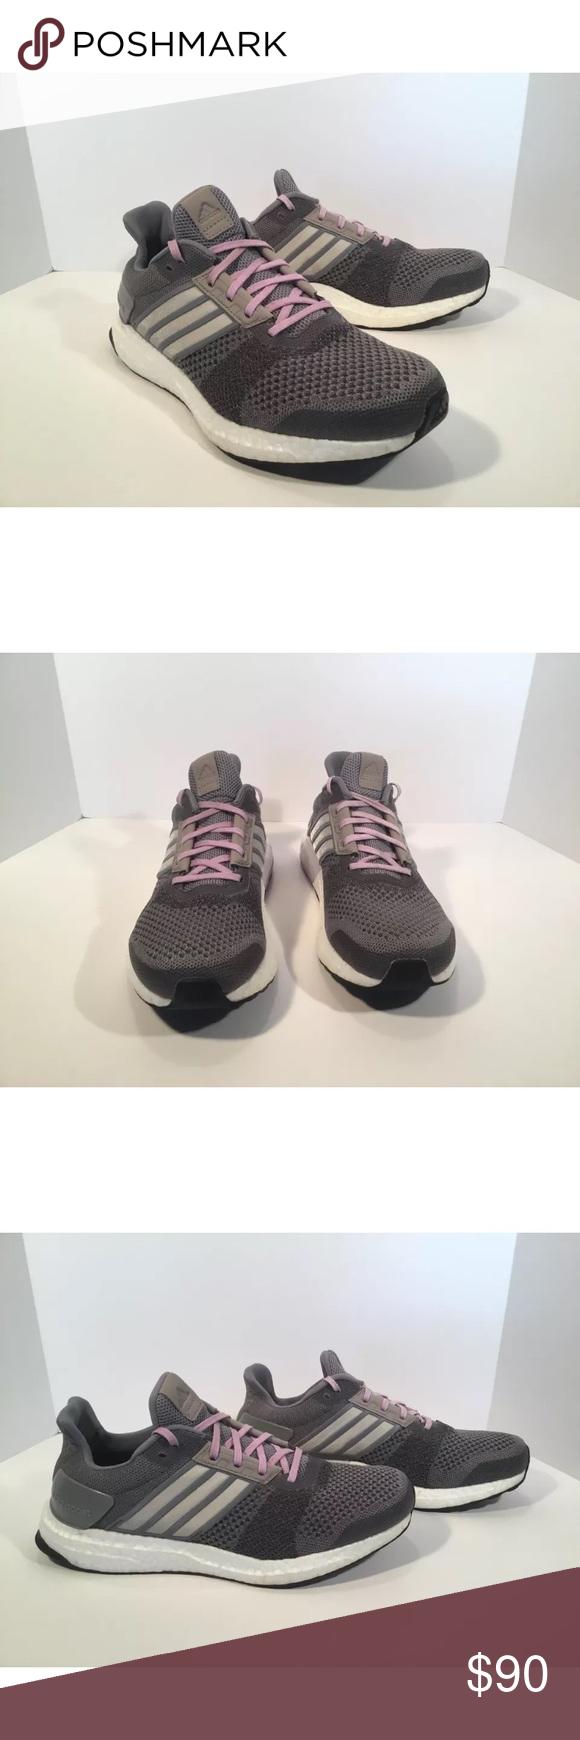 Adidas ultra Boost st tema detalles: marca Adidas en gran